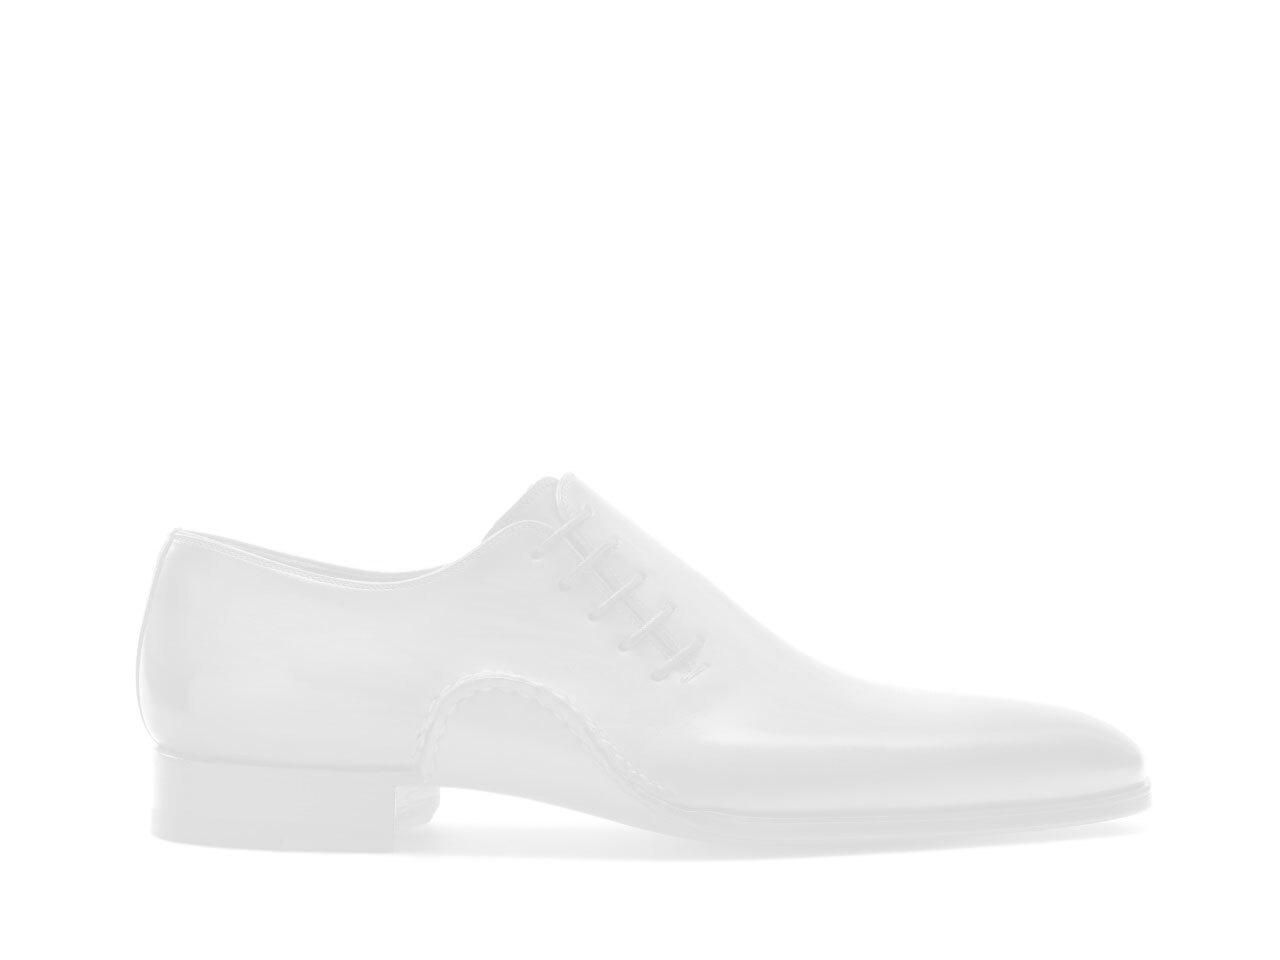 Side view of the Magnanni Dorio Black Men's Velvet Loafers